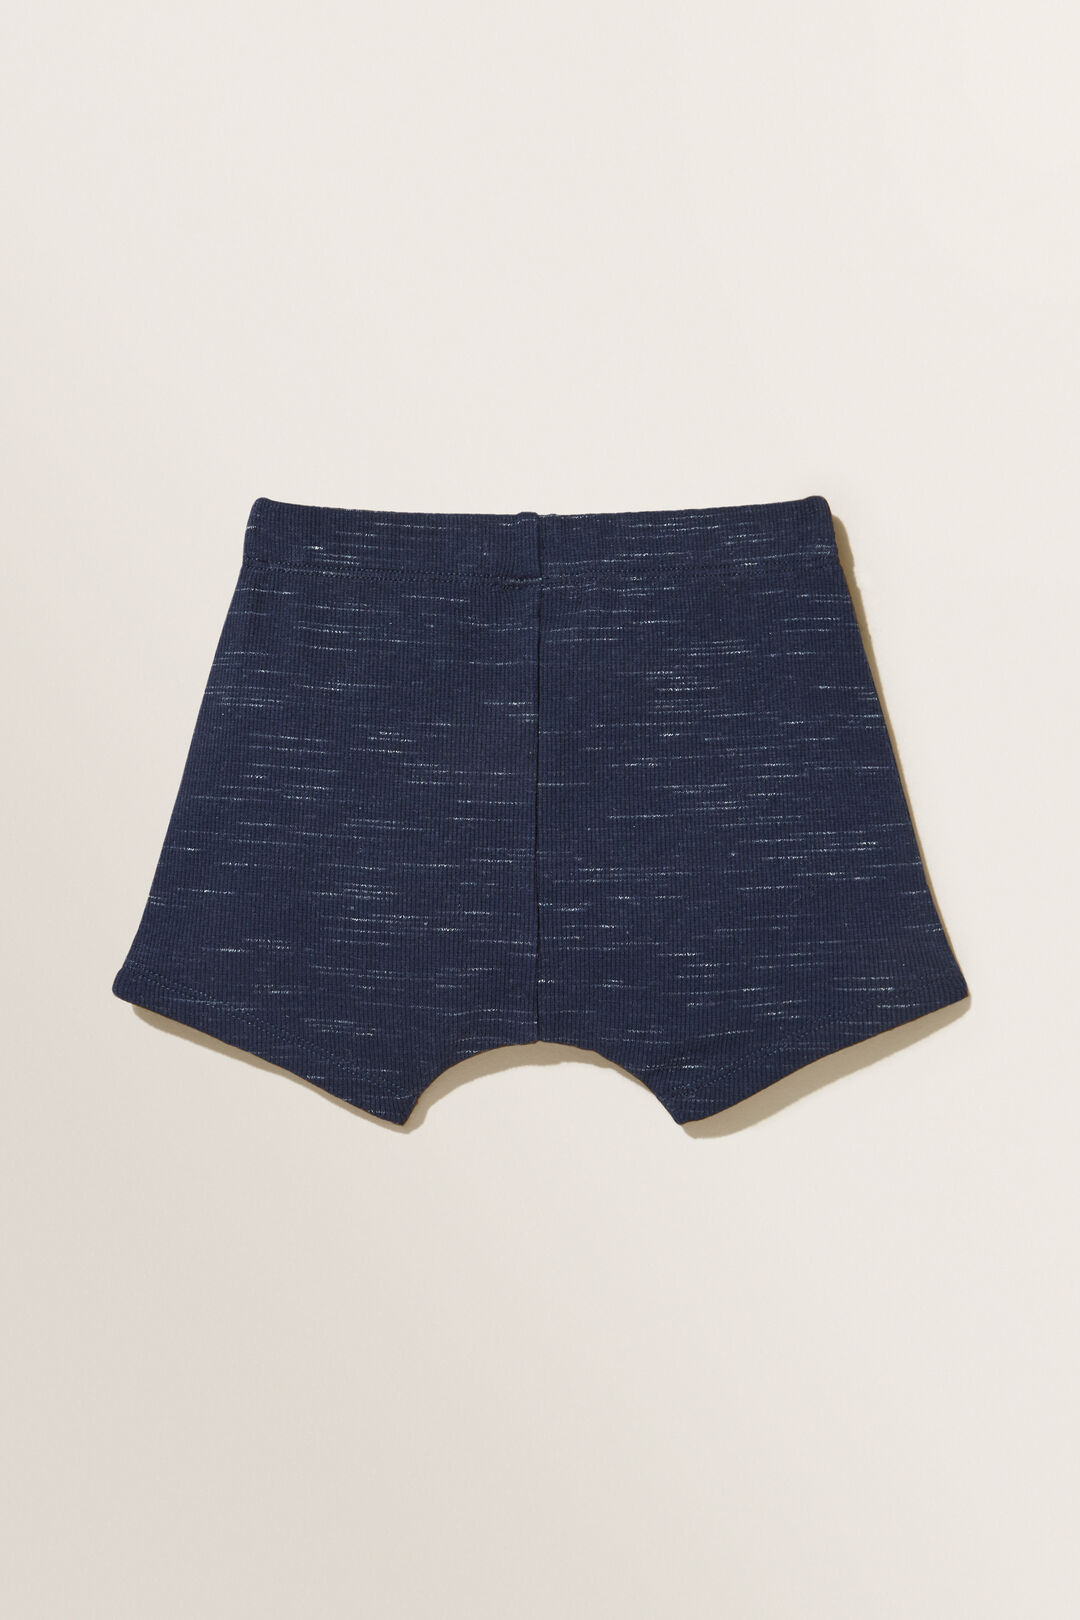 Space Dye Shorts  MIDNIGHT BLUE  hi-res